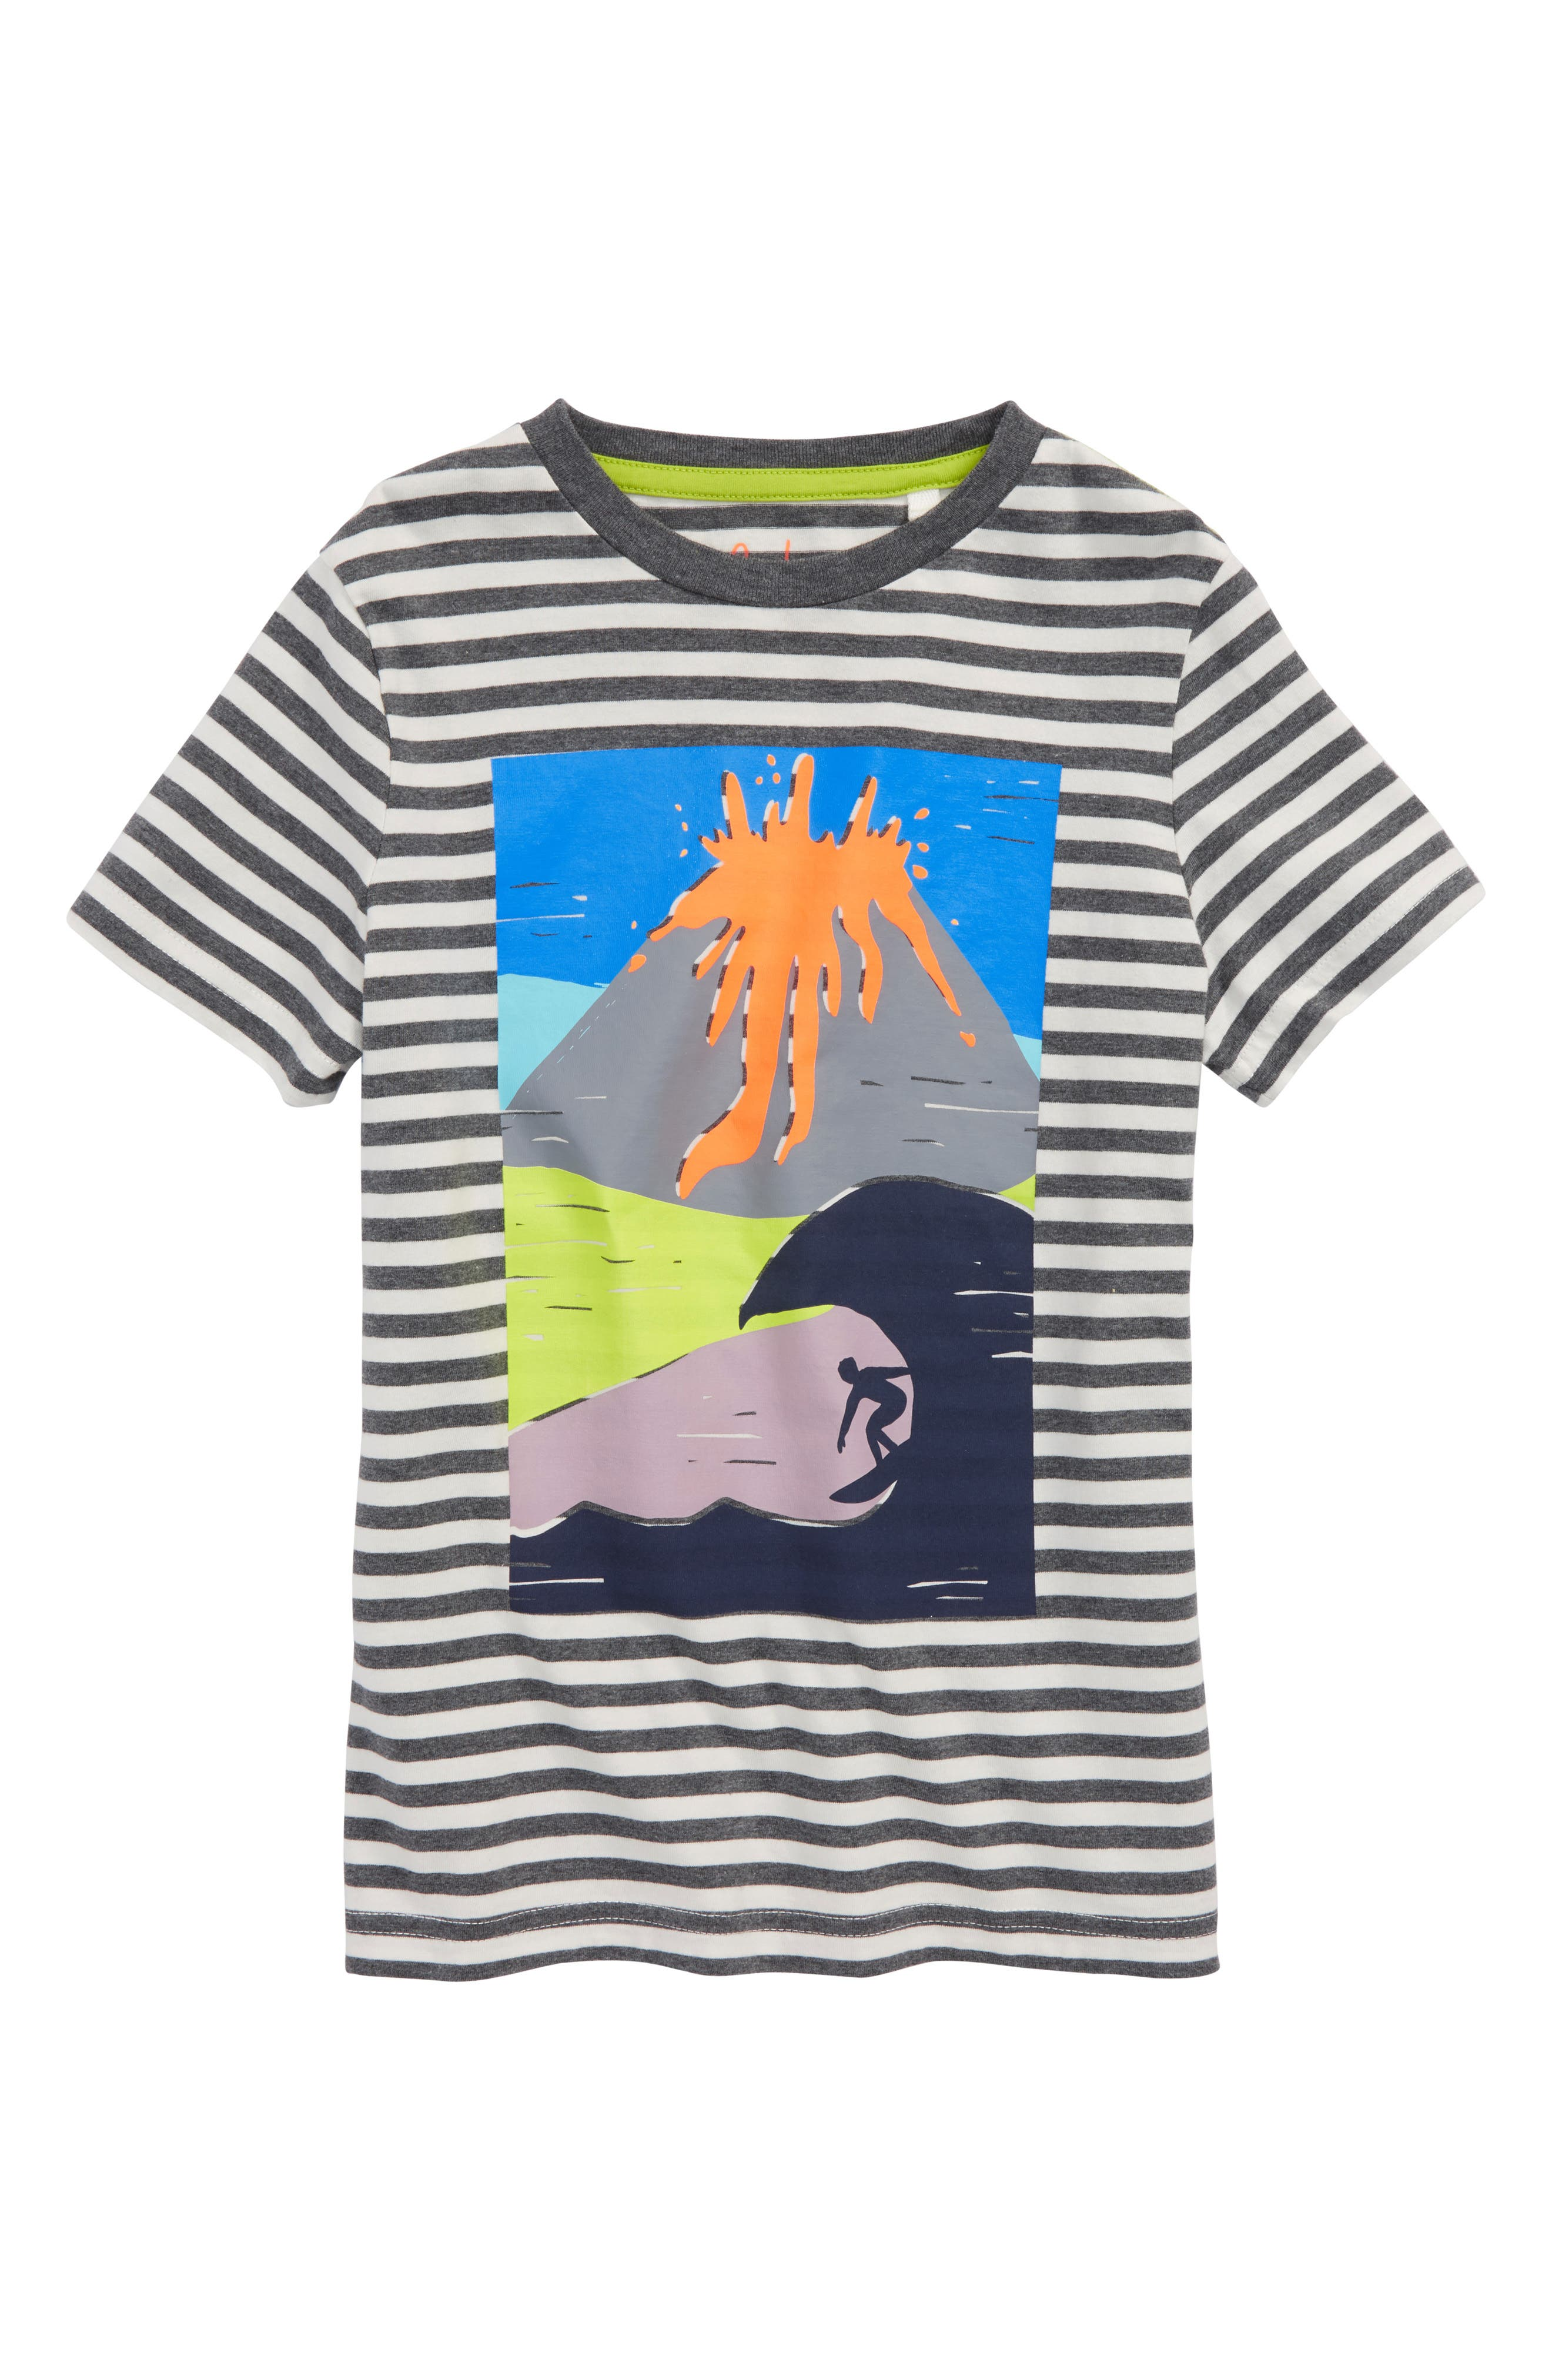 Arty Volcano T-Shirt,                         Main,                         color, 062